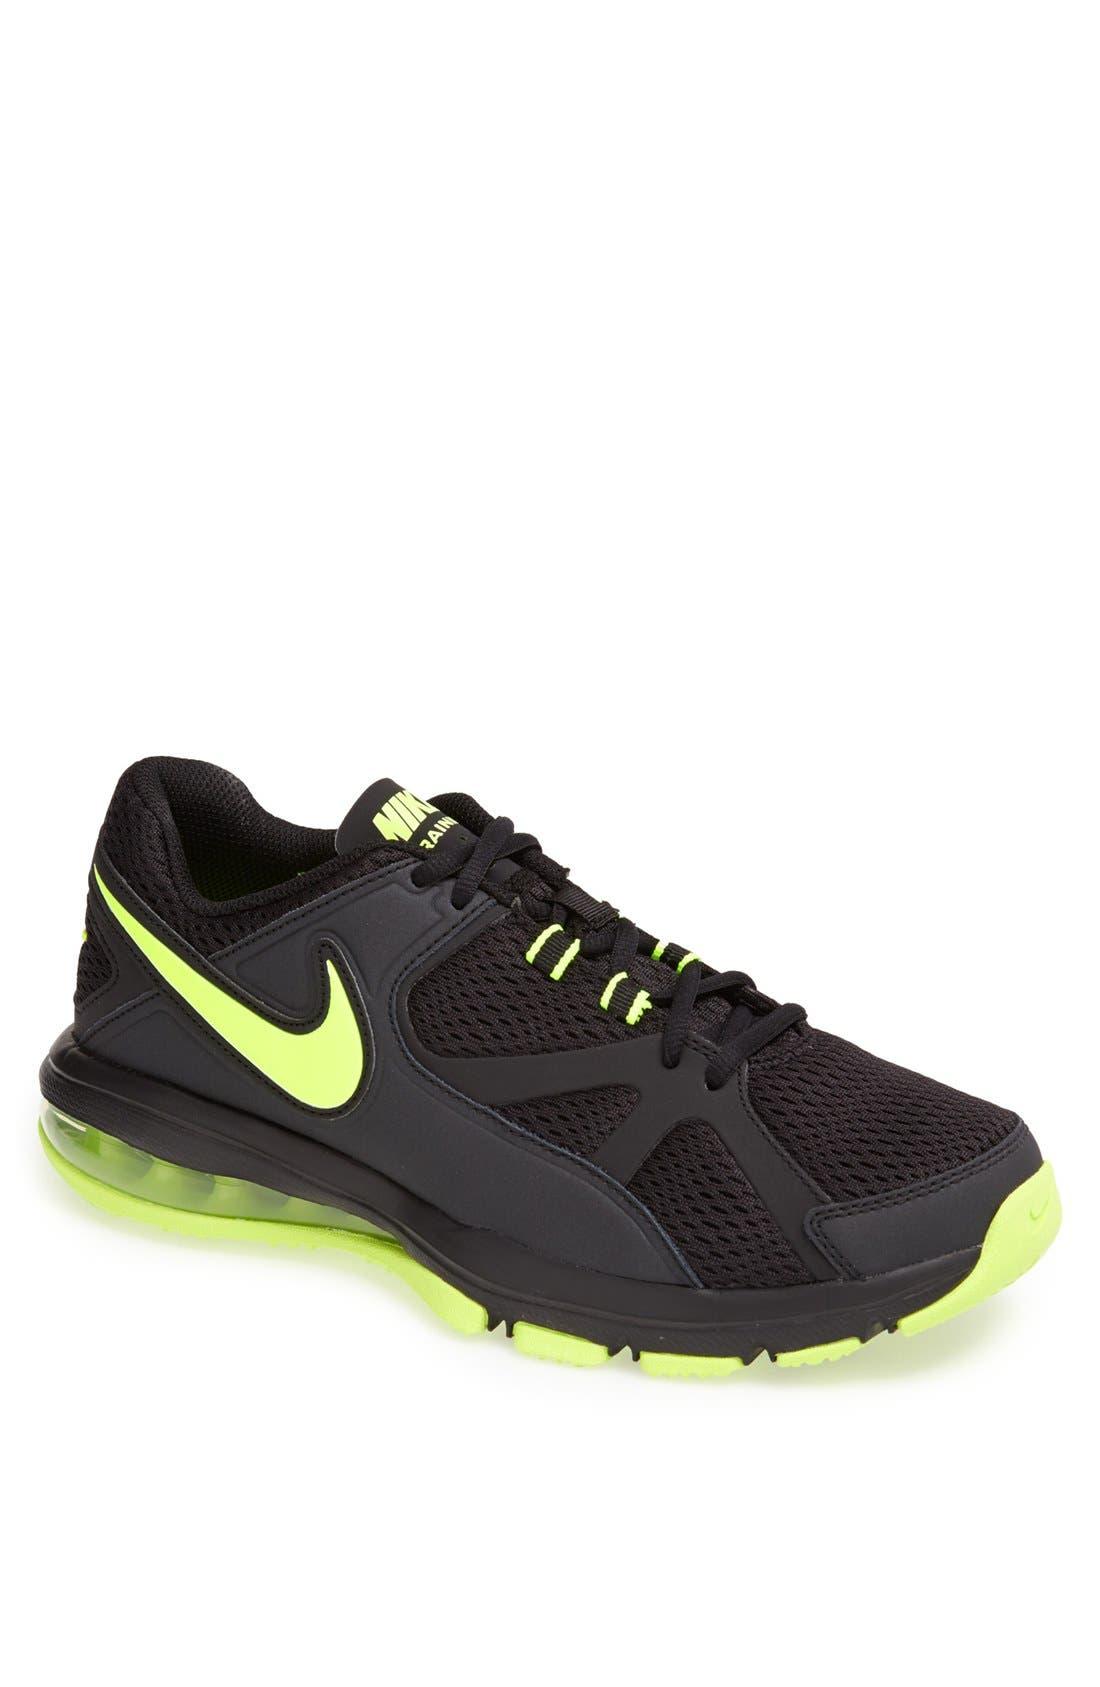 Main Image - Nike 'Air Max Compete TR' Training Shoe (Men)